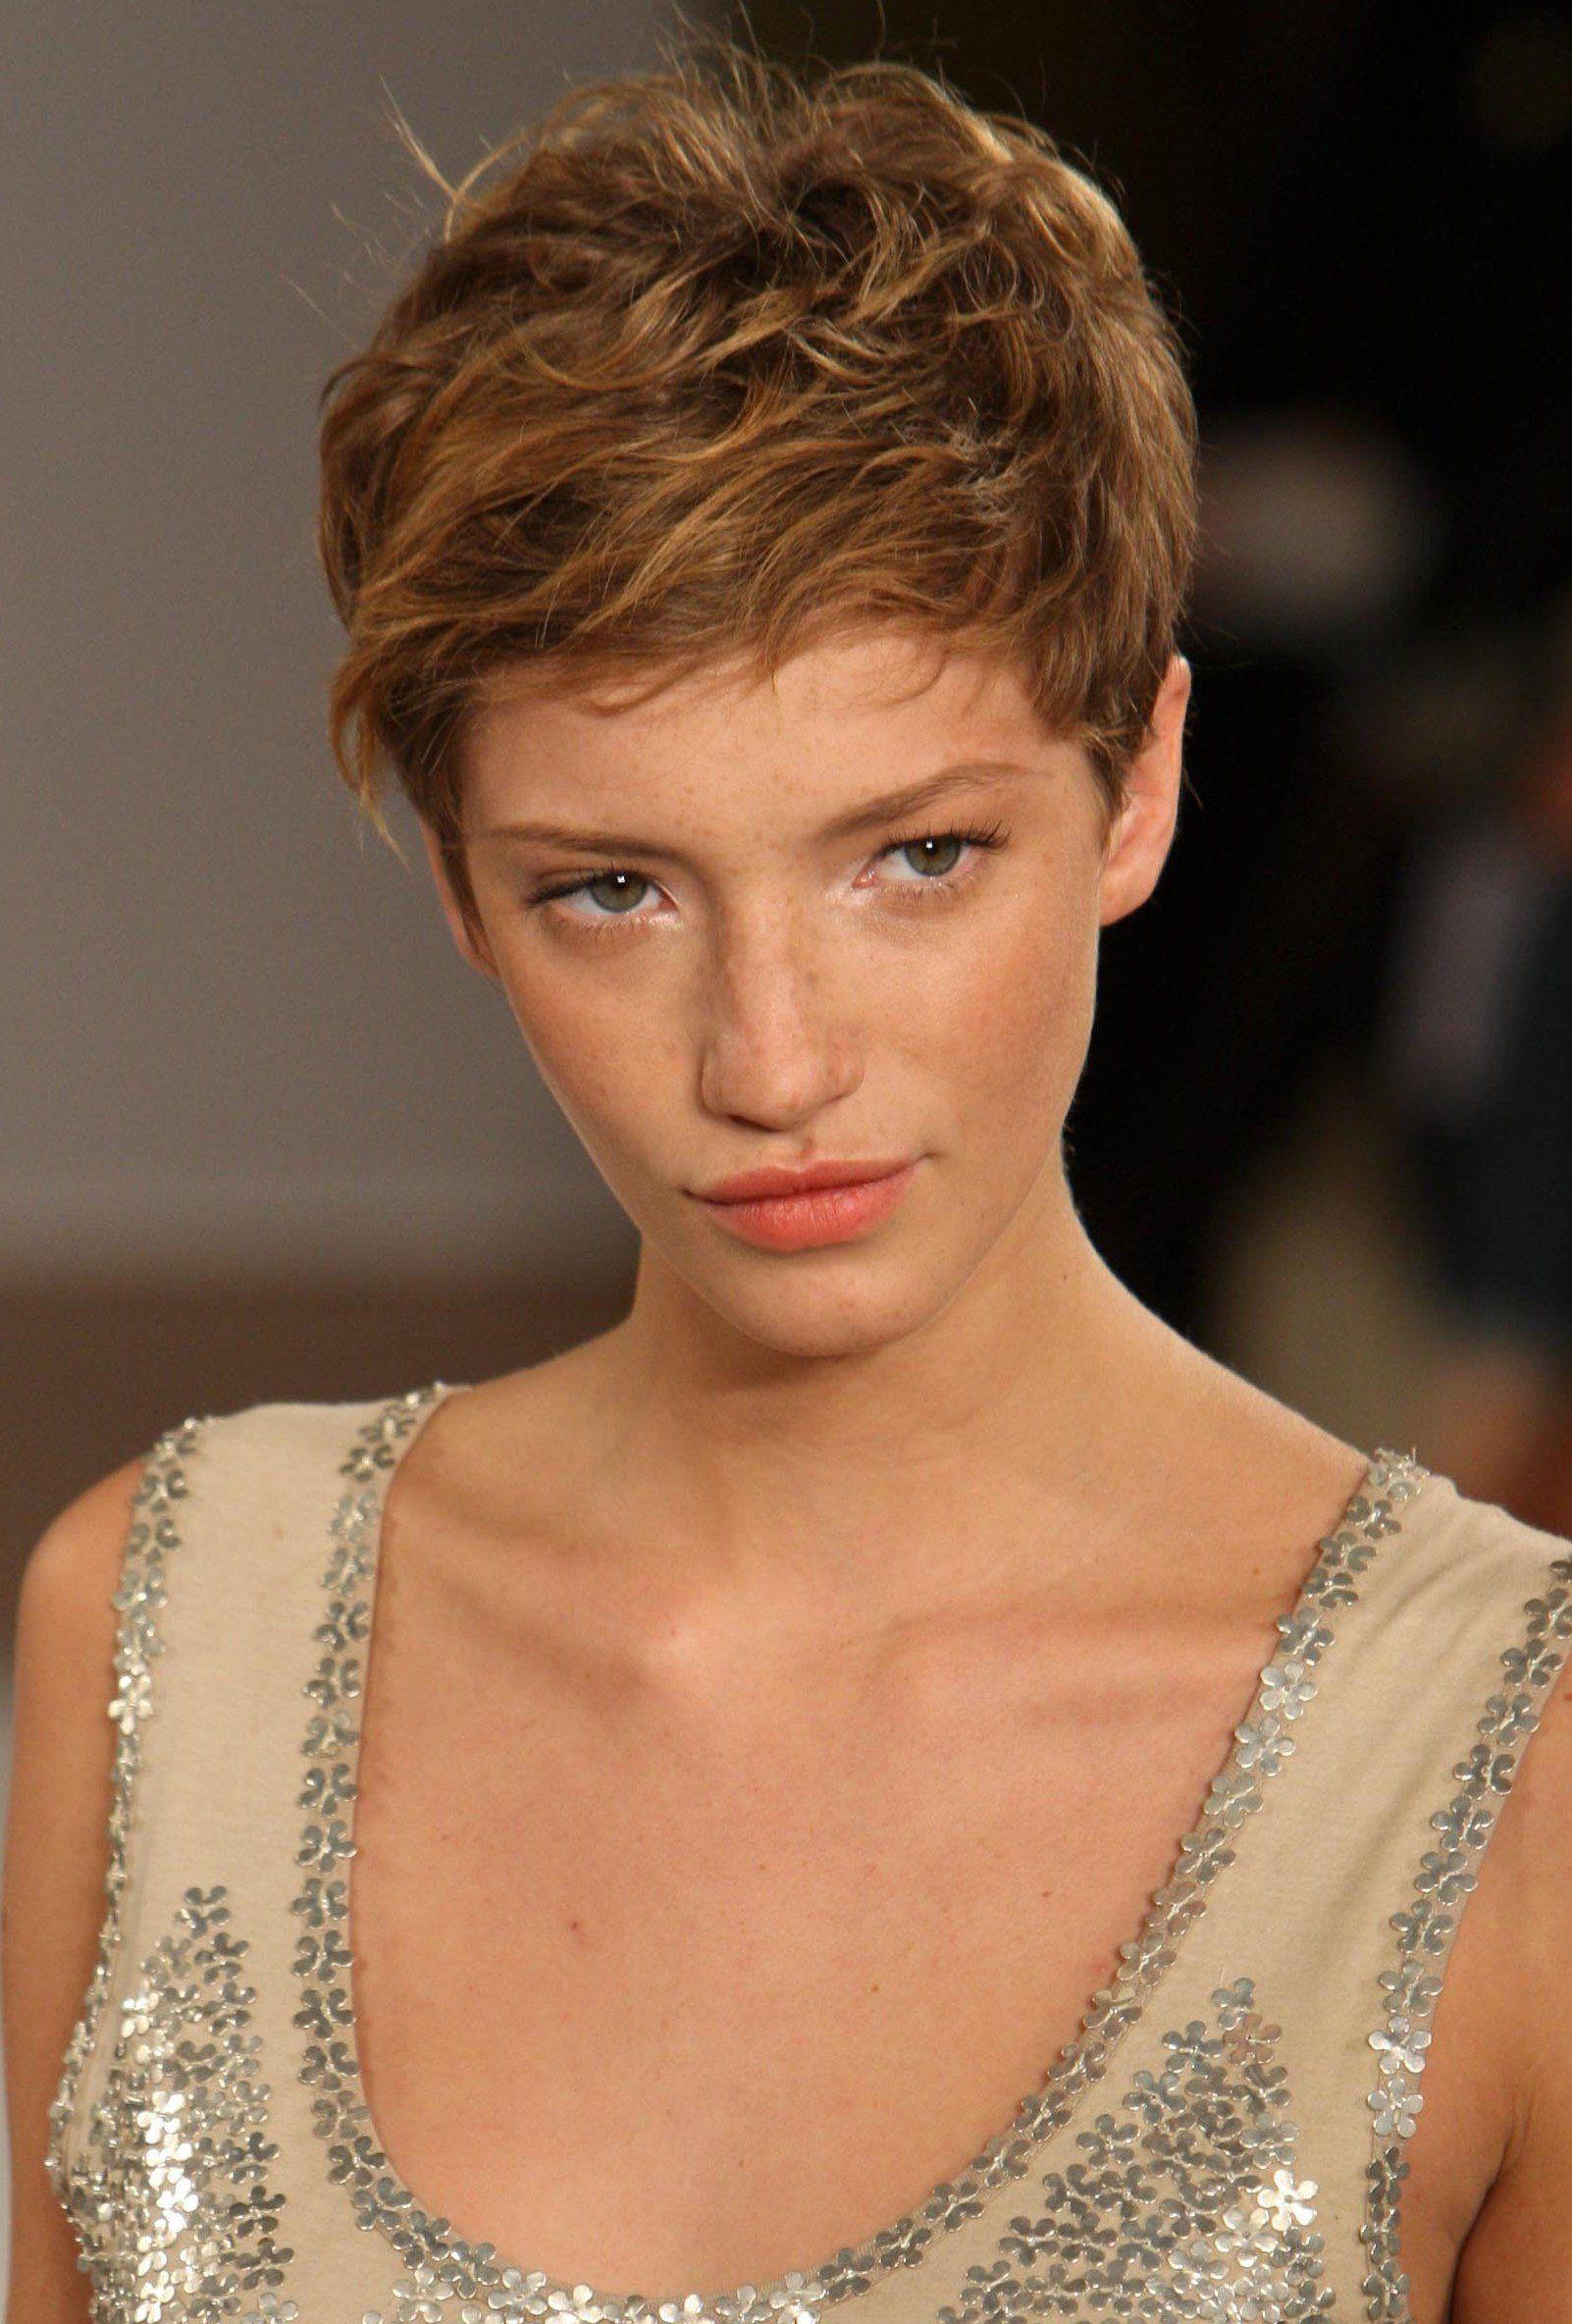 Kort hår googlesøgning Зуля pinterest short pixie haircuts